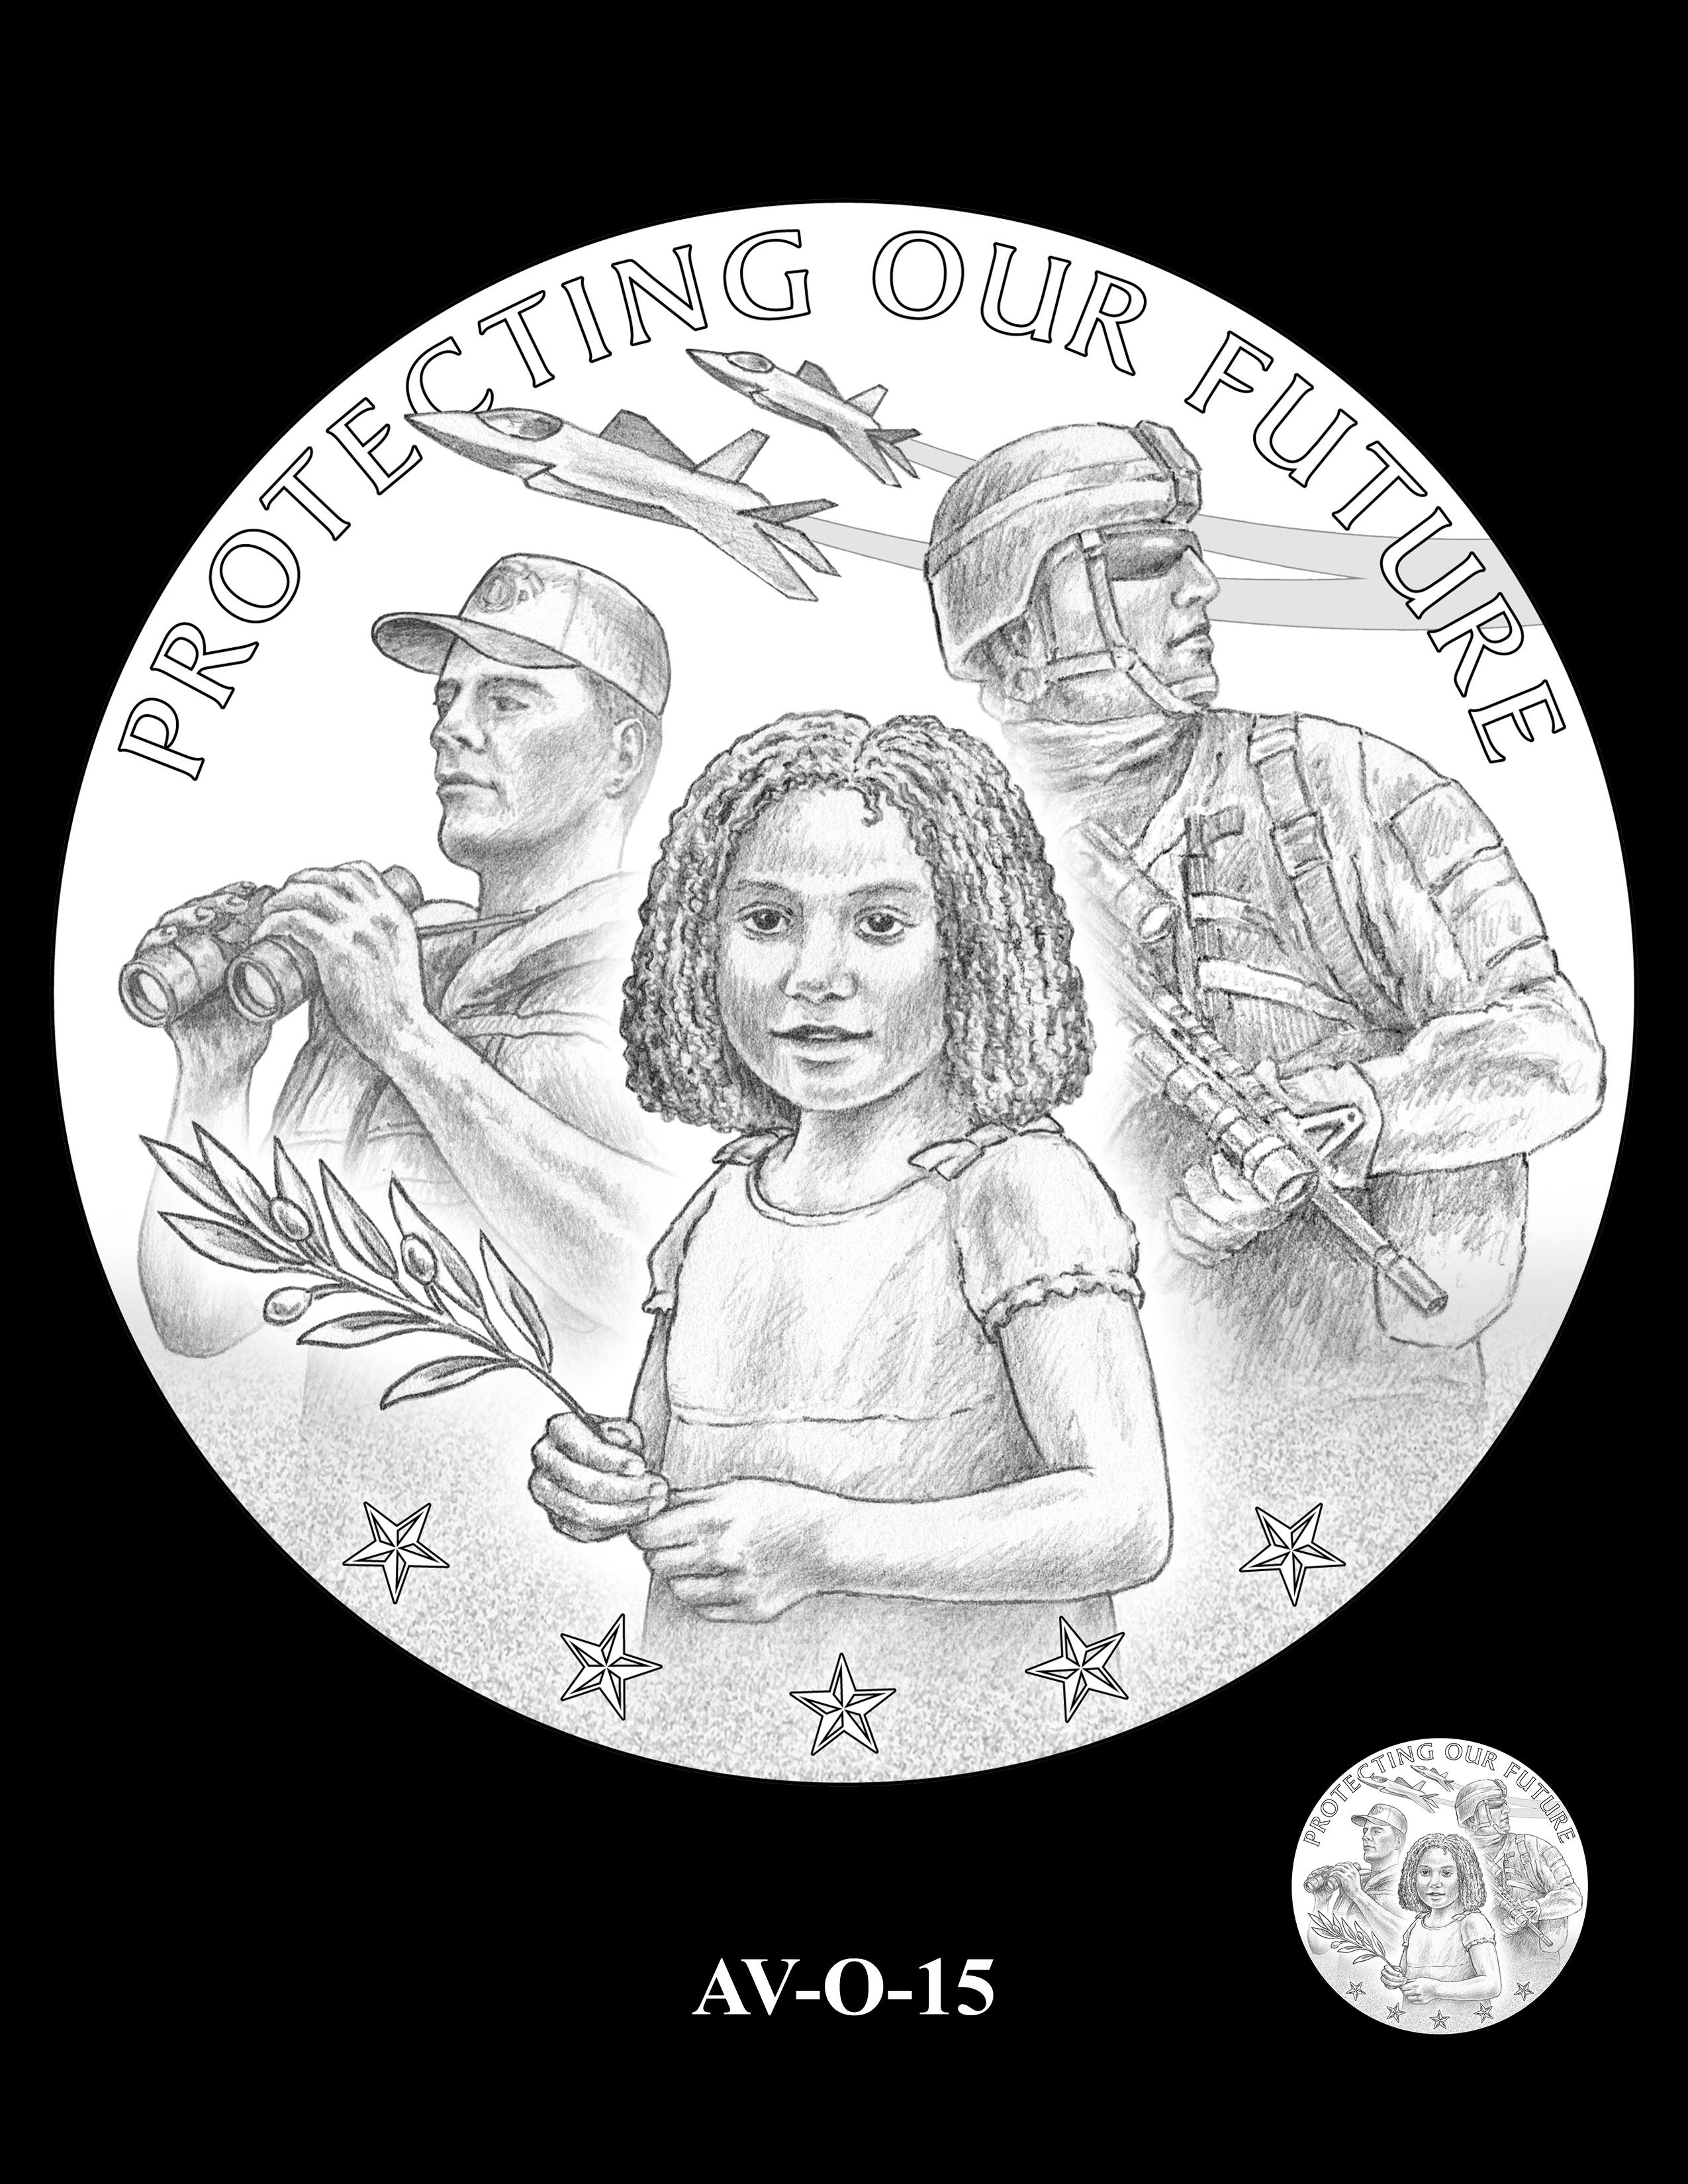 AV-O-15 - American Veterans Medal